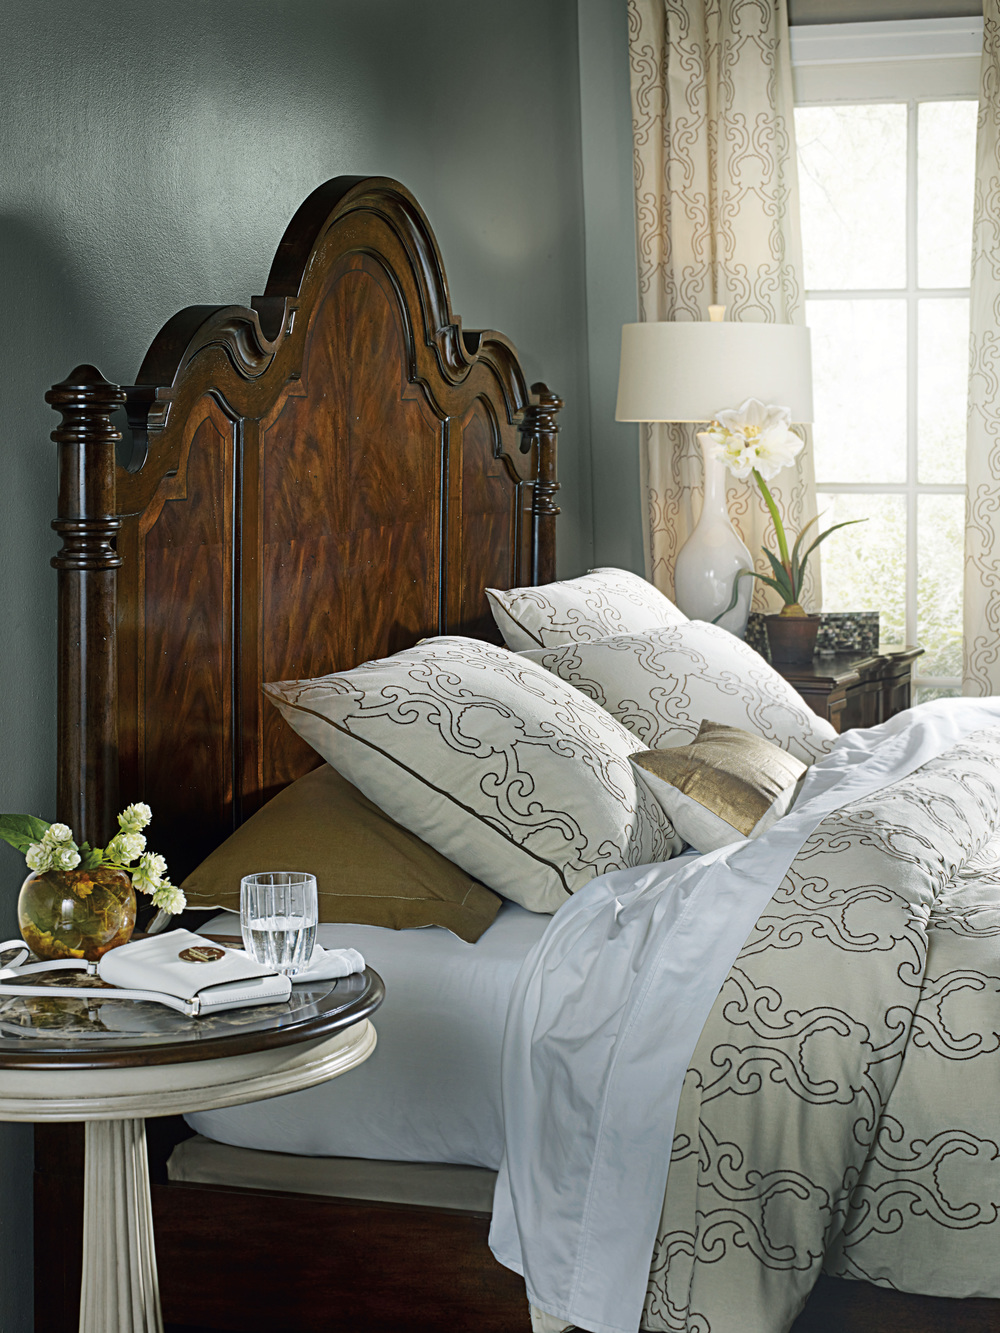 Hooker Furniture - California King Poster Bed